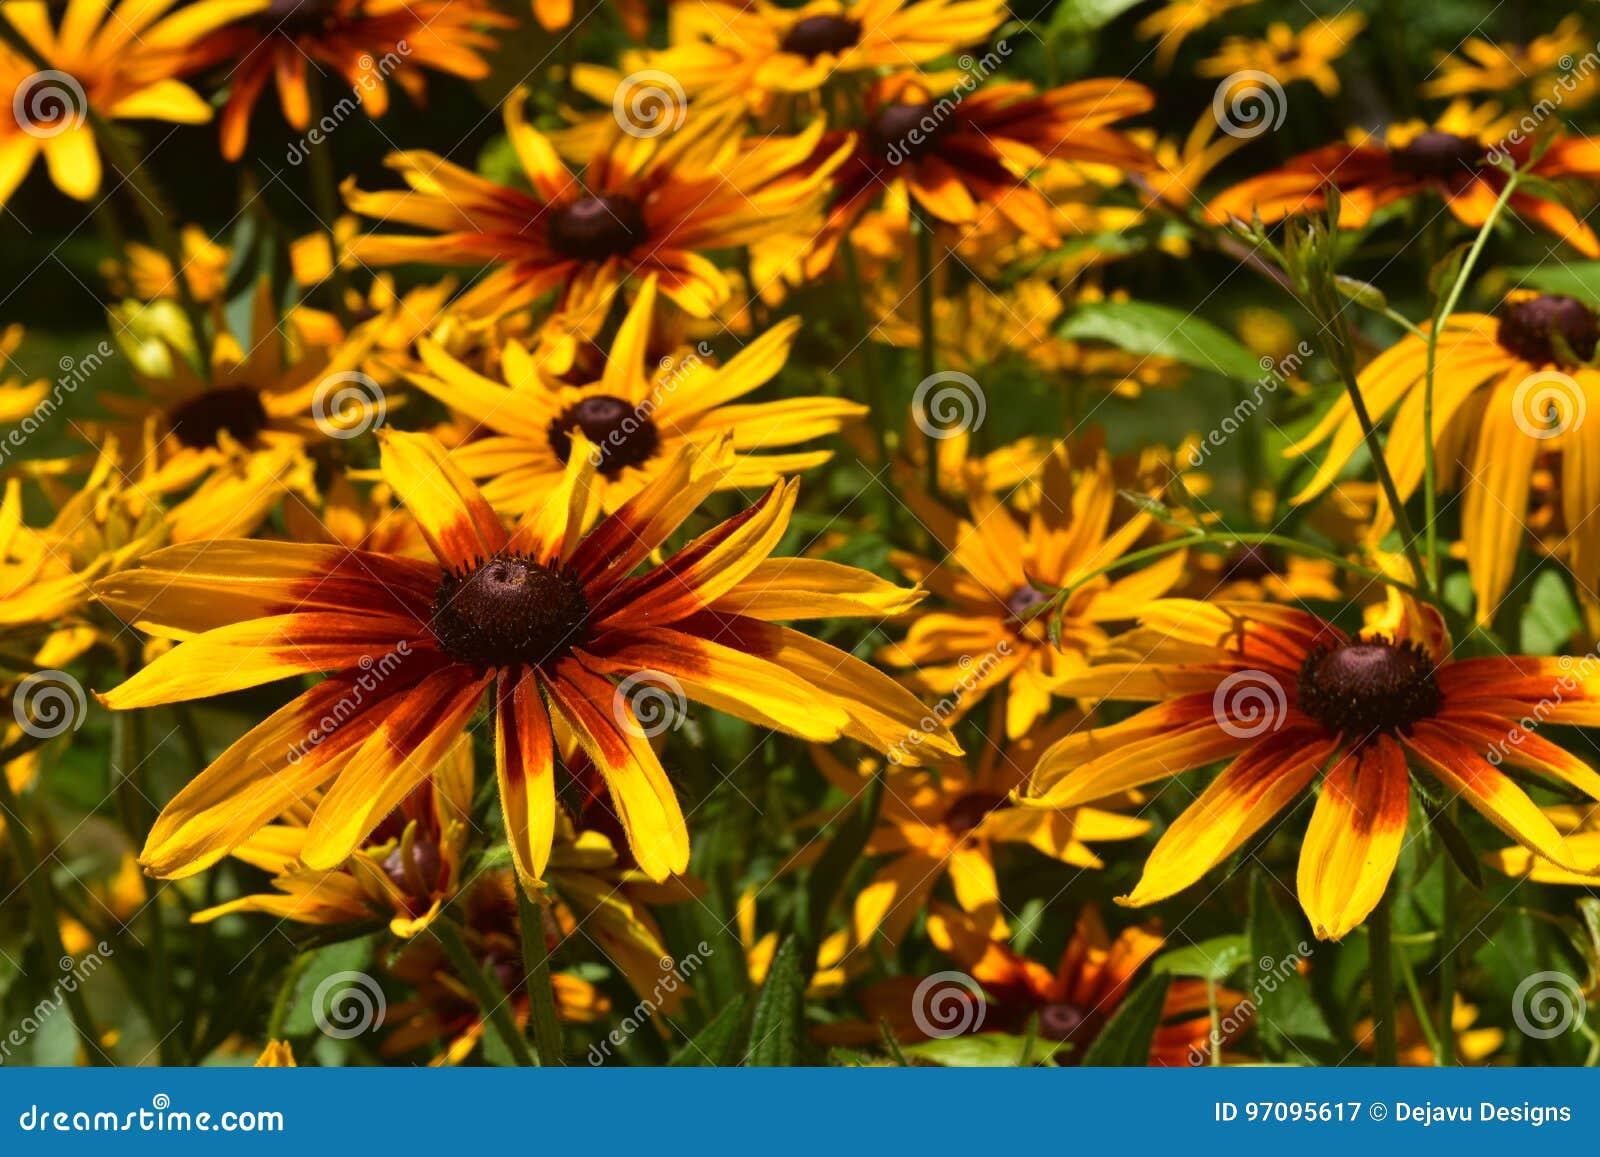 Beautiful Abundance of Black Eyed Susan Flowers